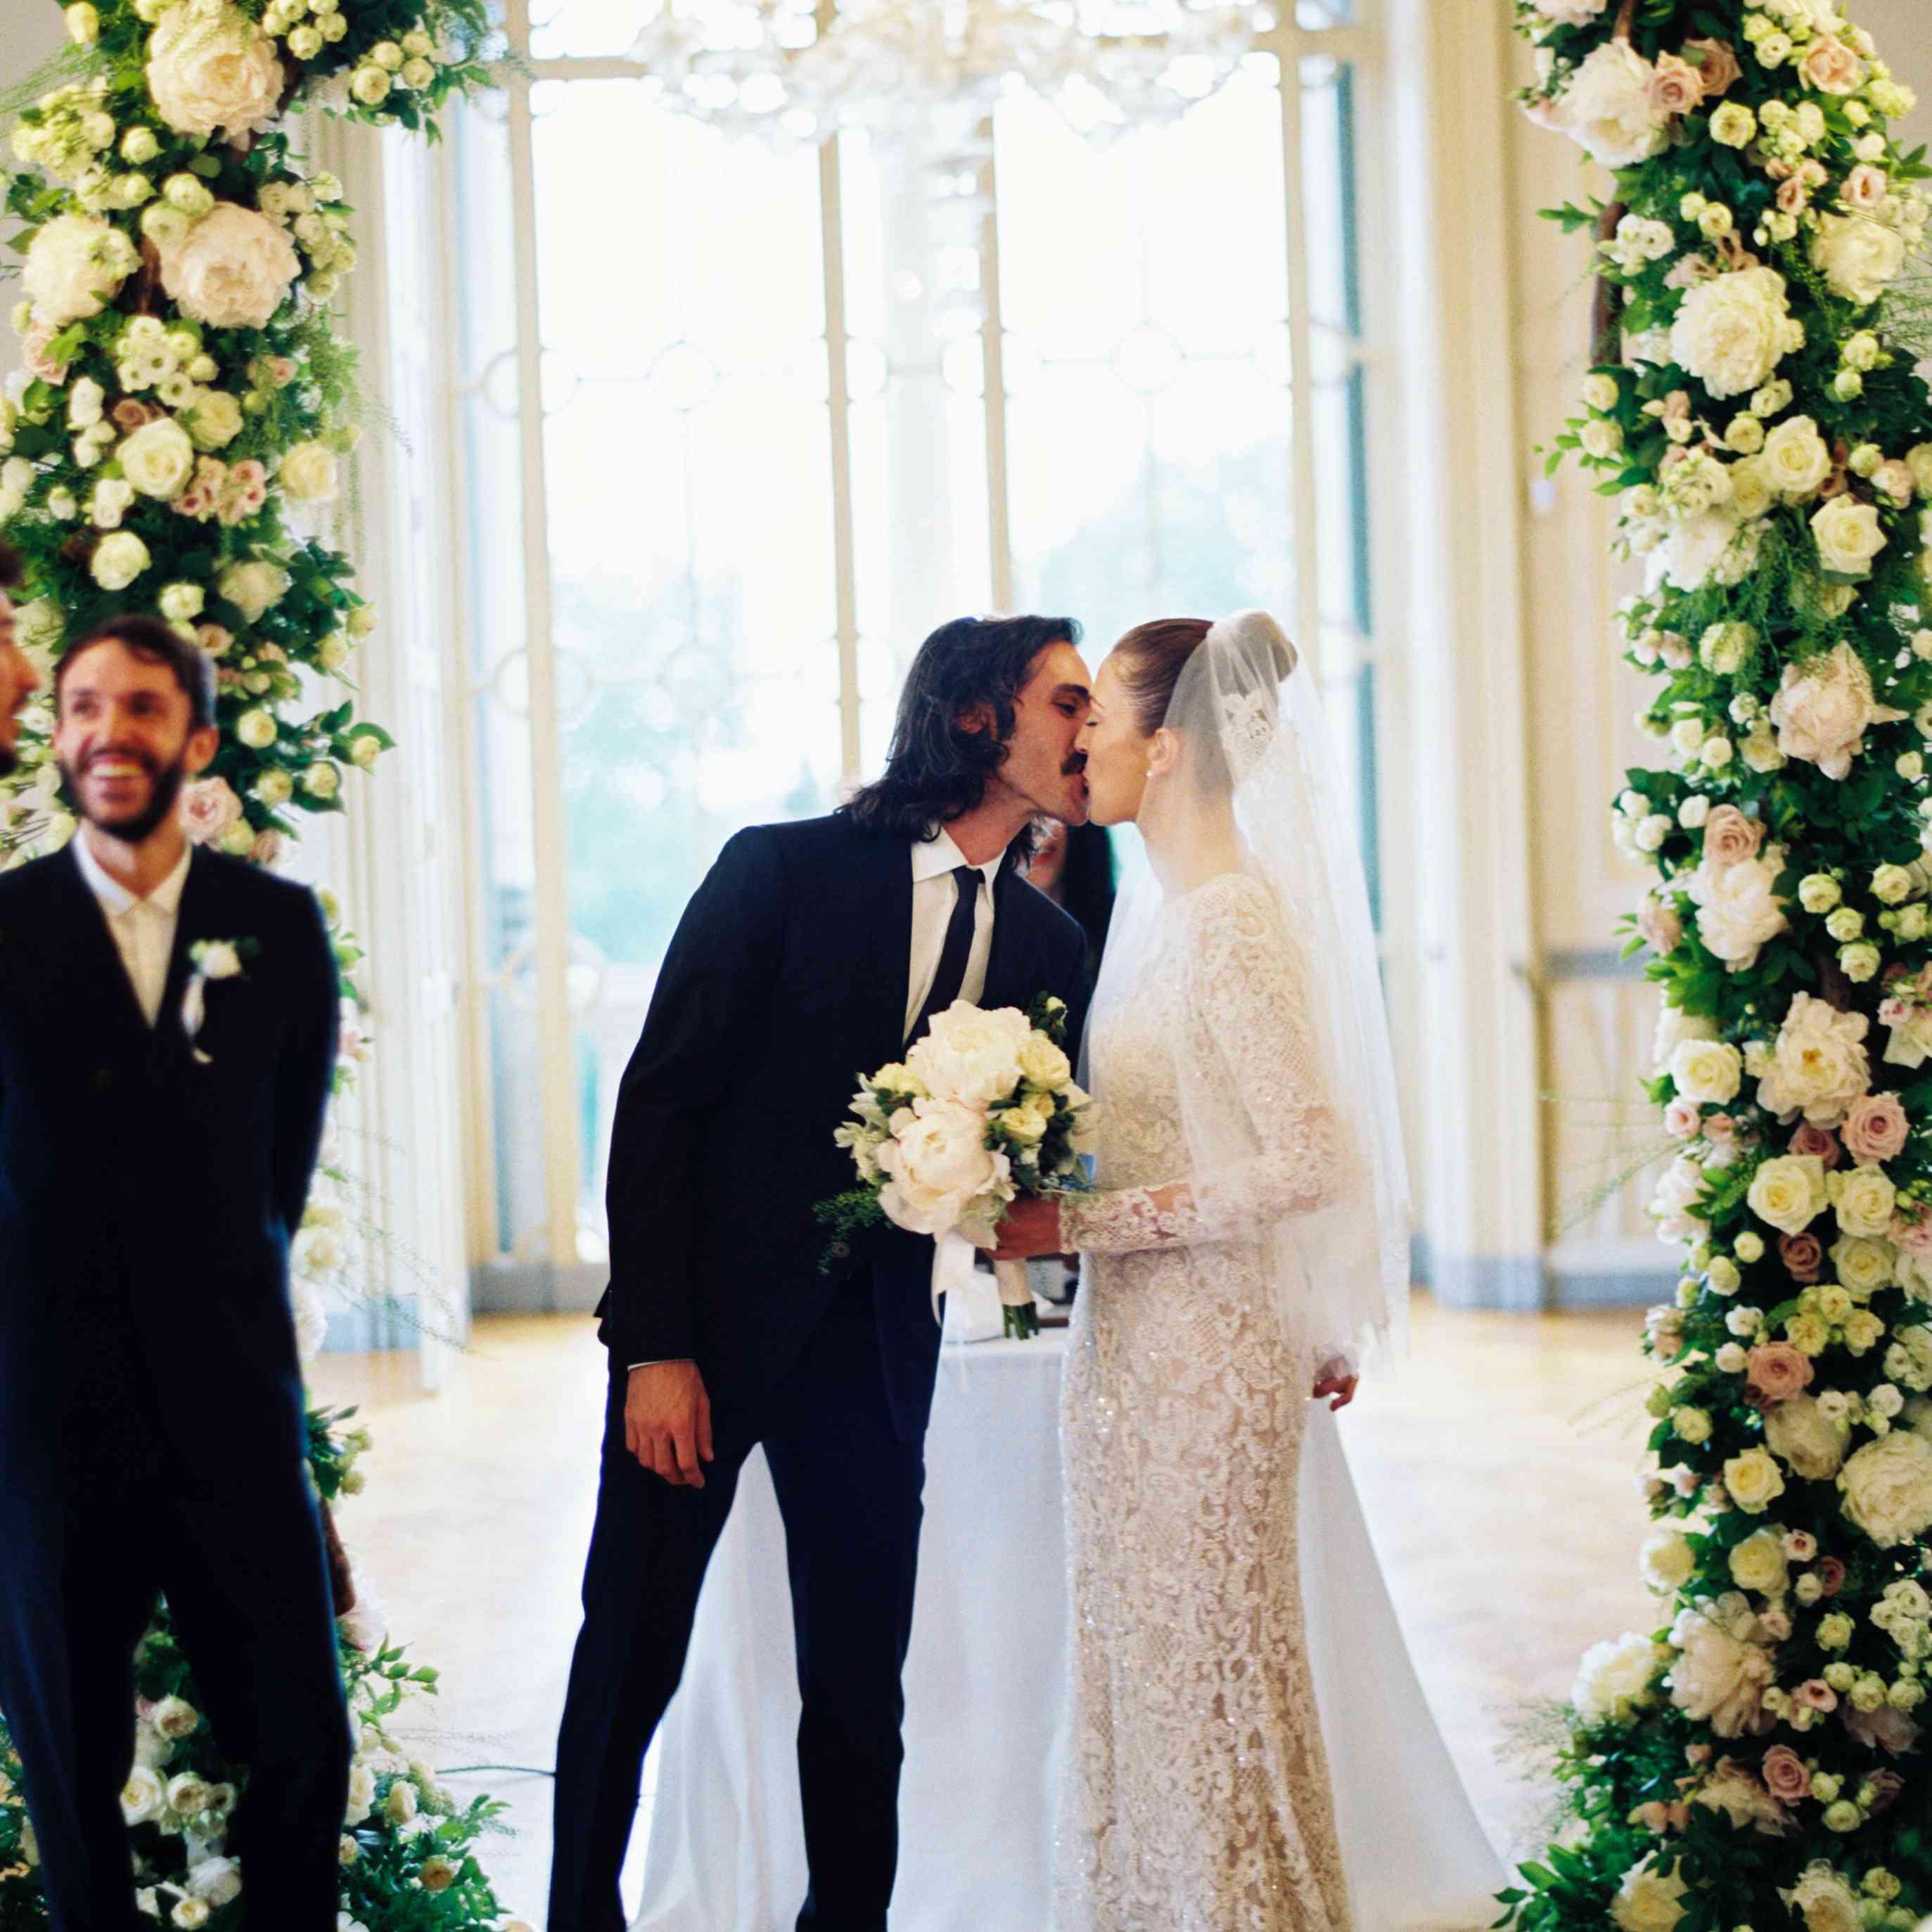 Northern Italian Wedding, First Kiss